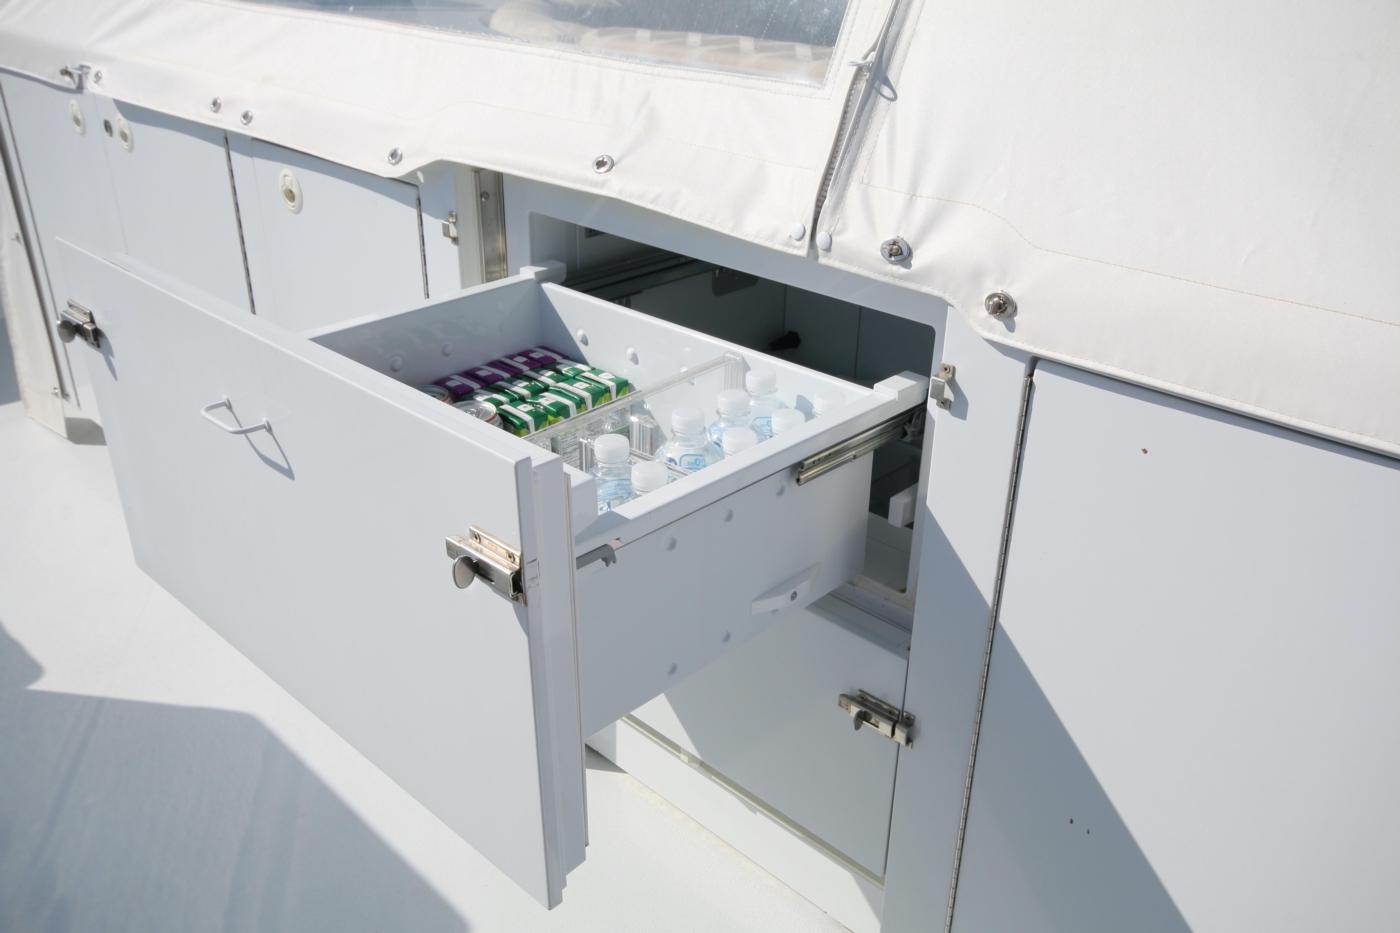 1997 Nordlund Motoryacht, Two drawer refrigerators